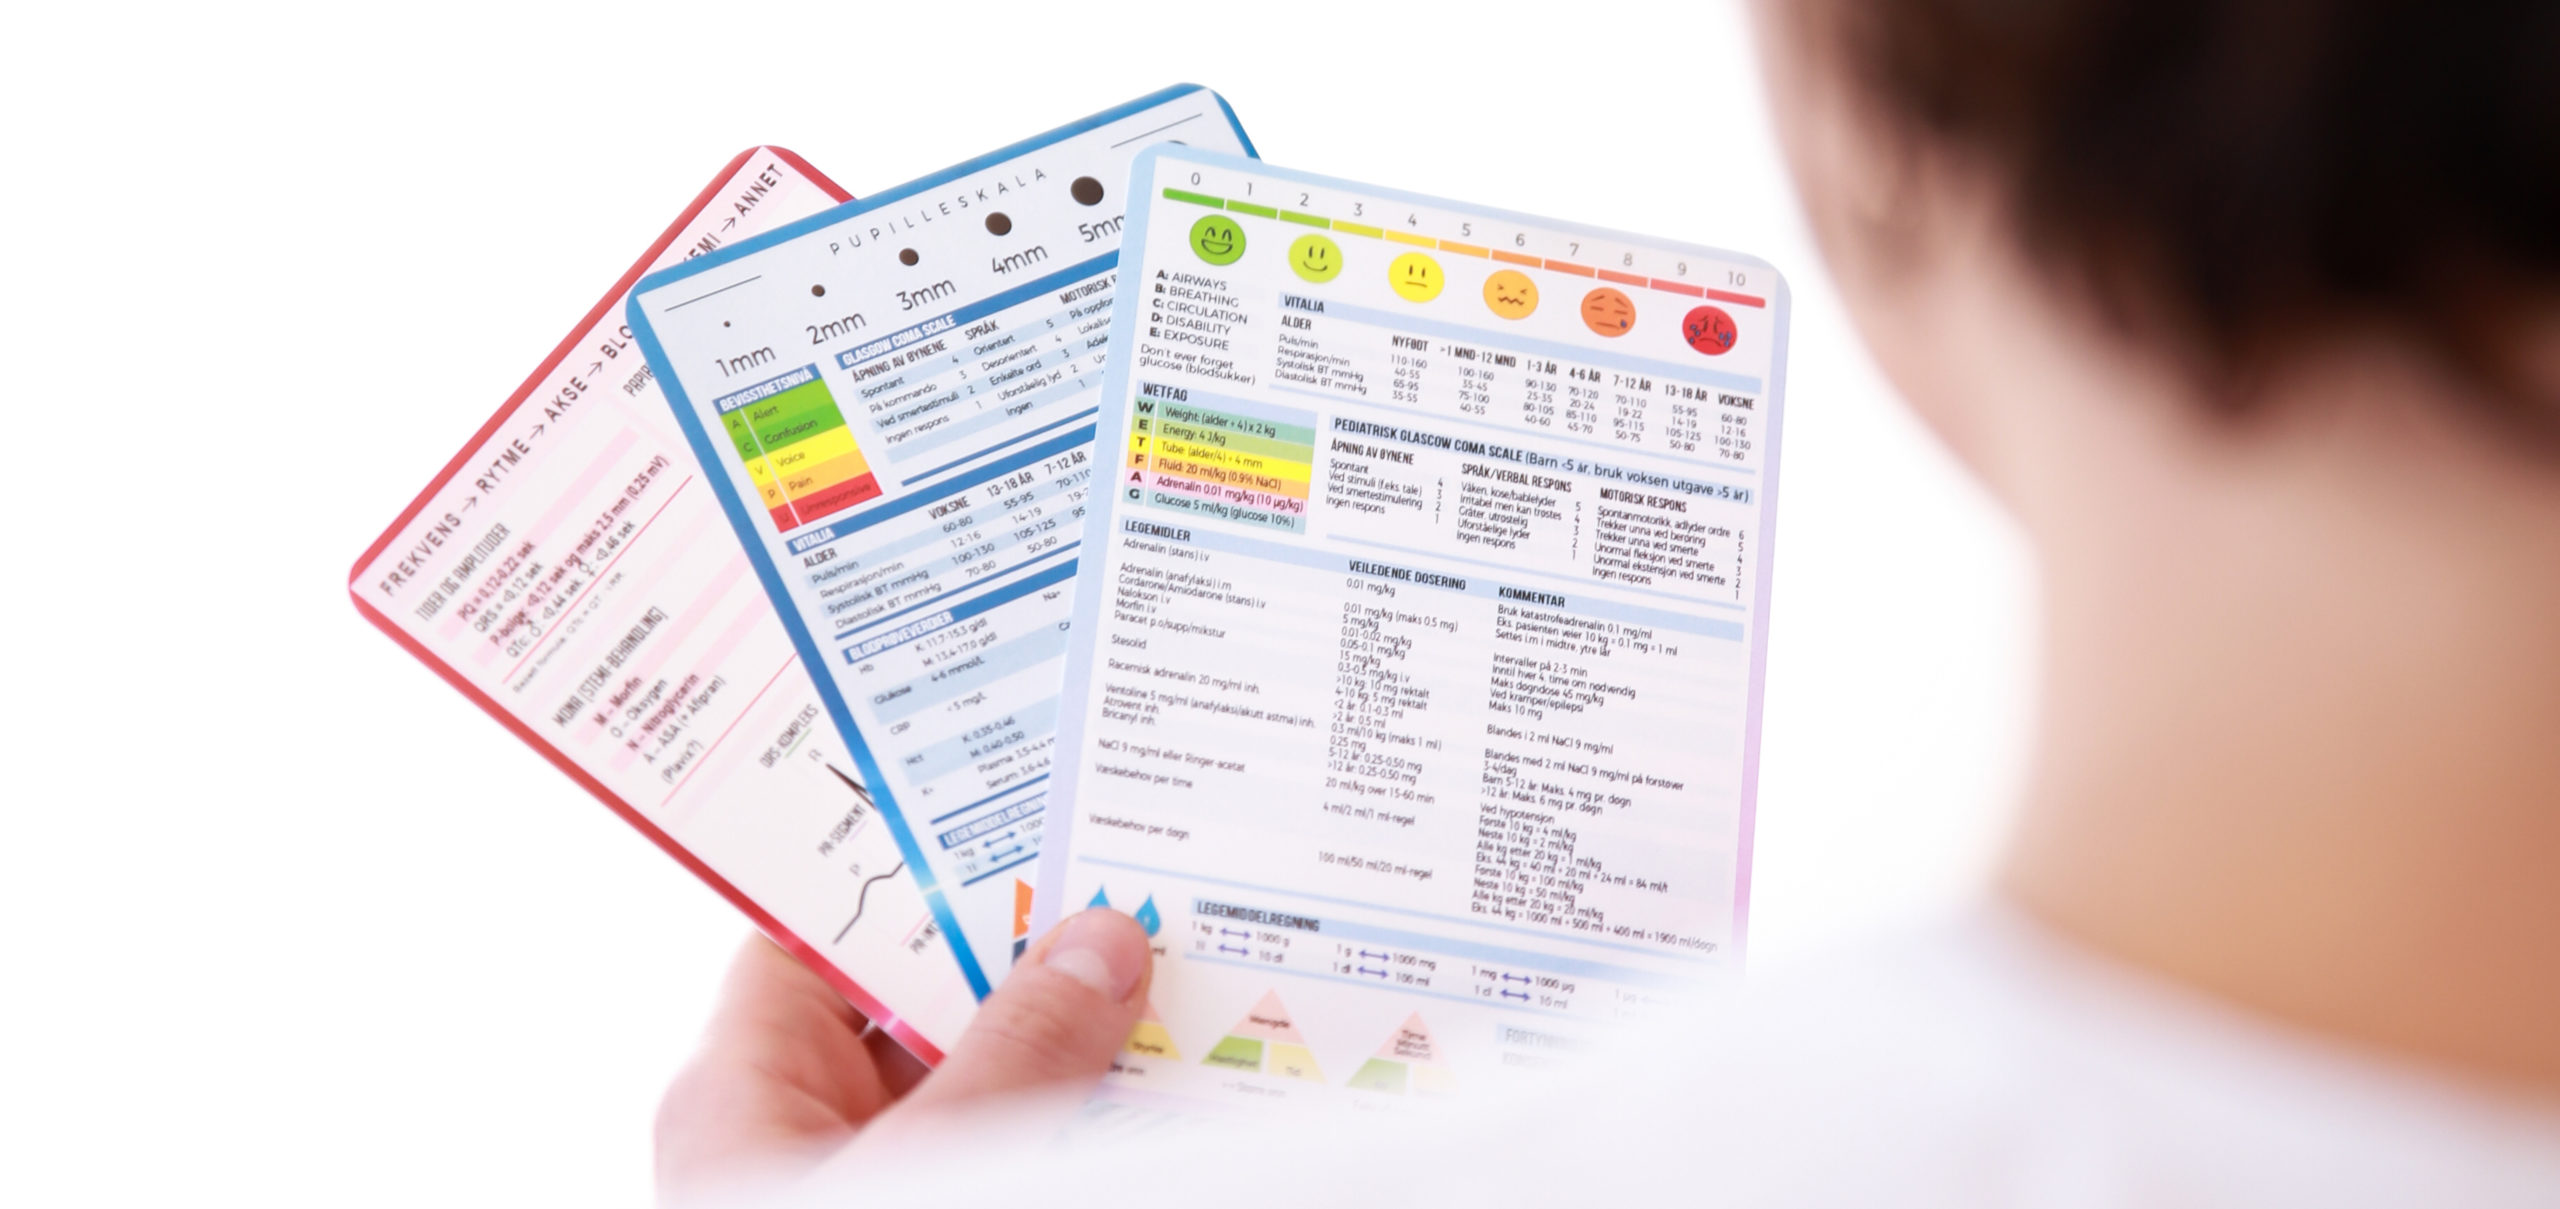 medisinske-referansekort-ekg-medisinsk-cingulum